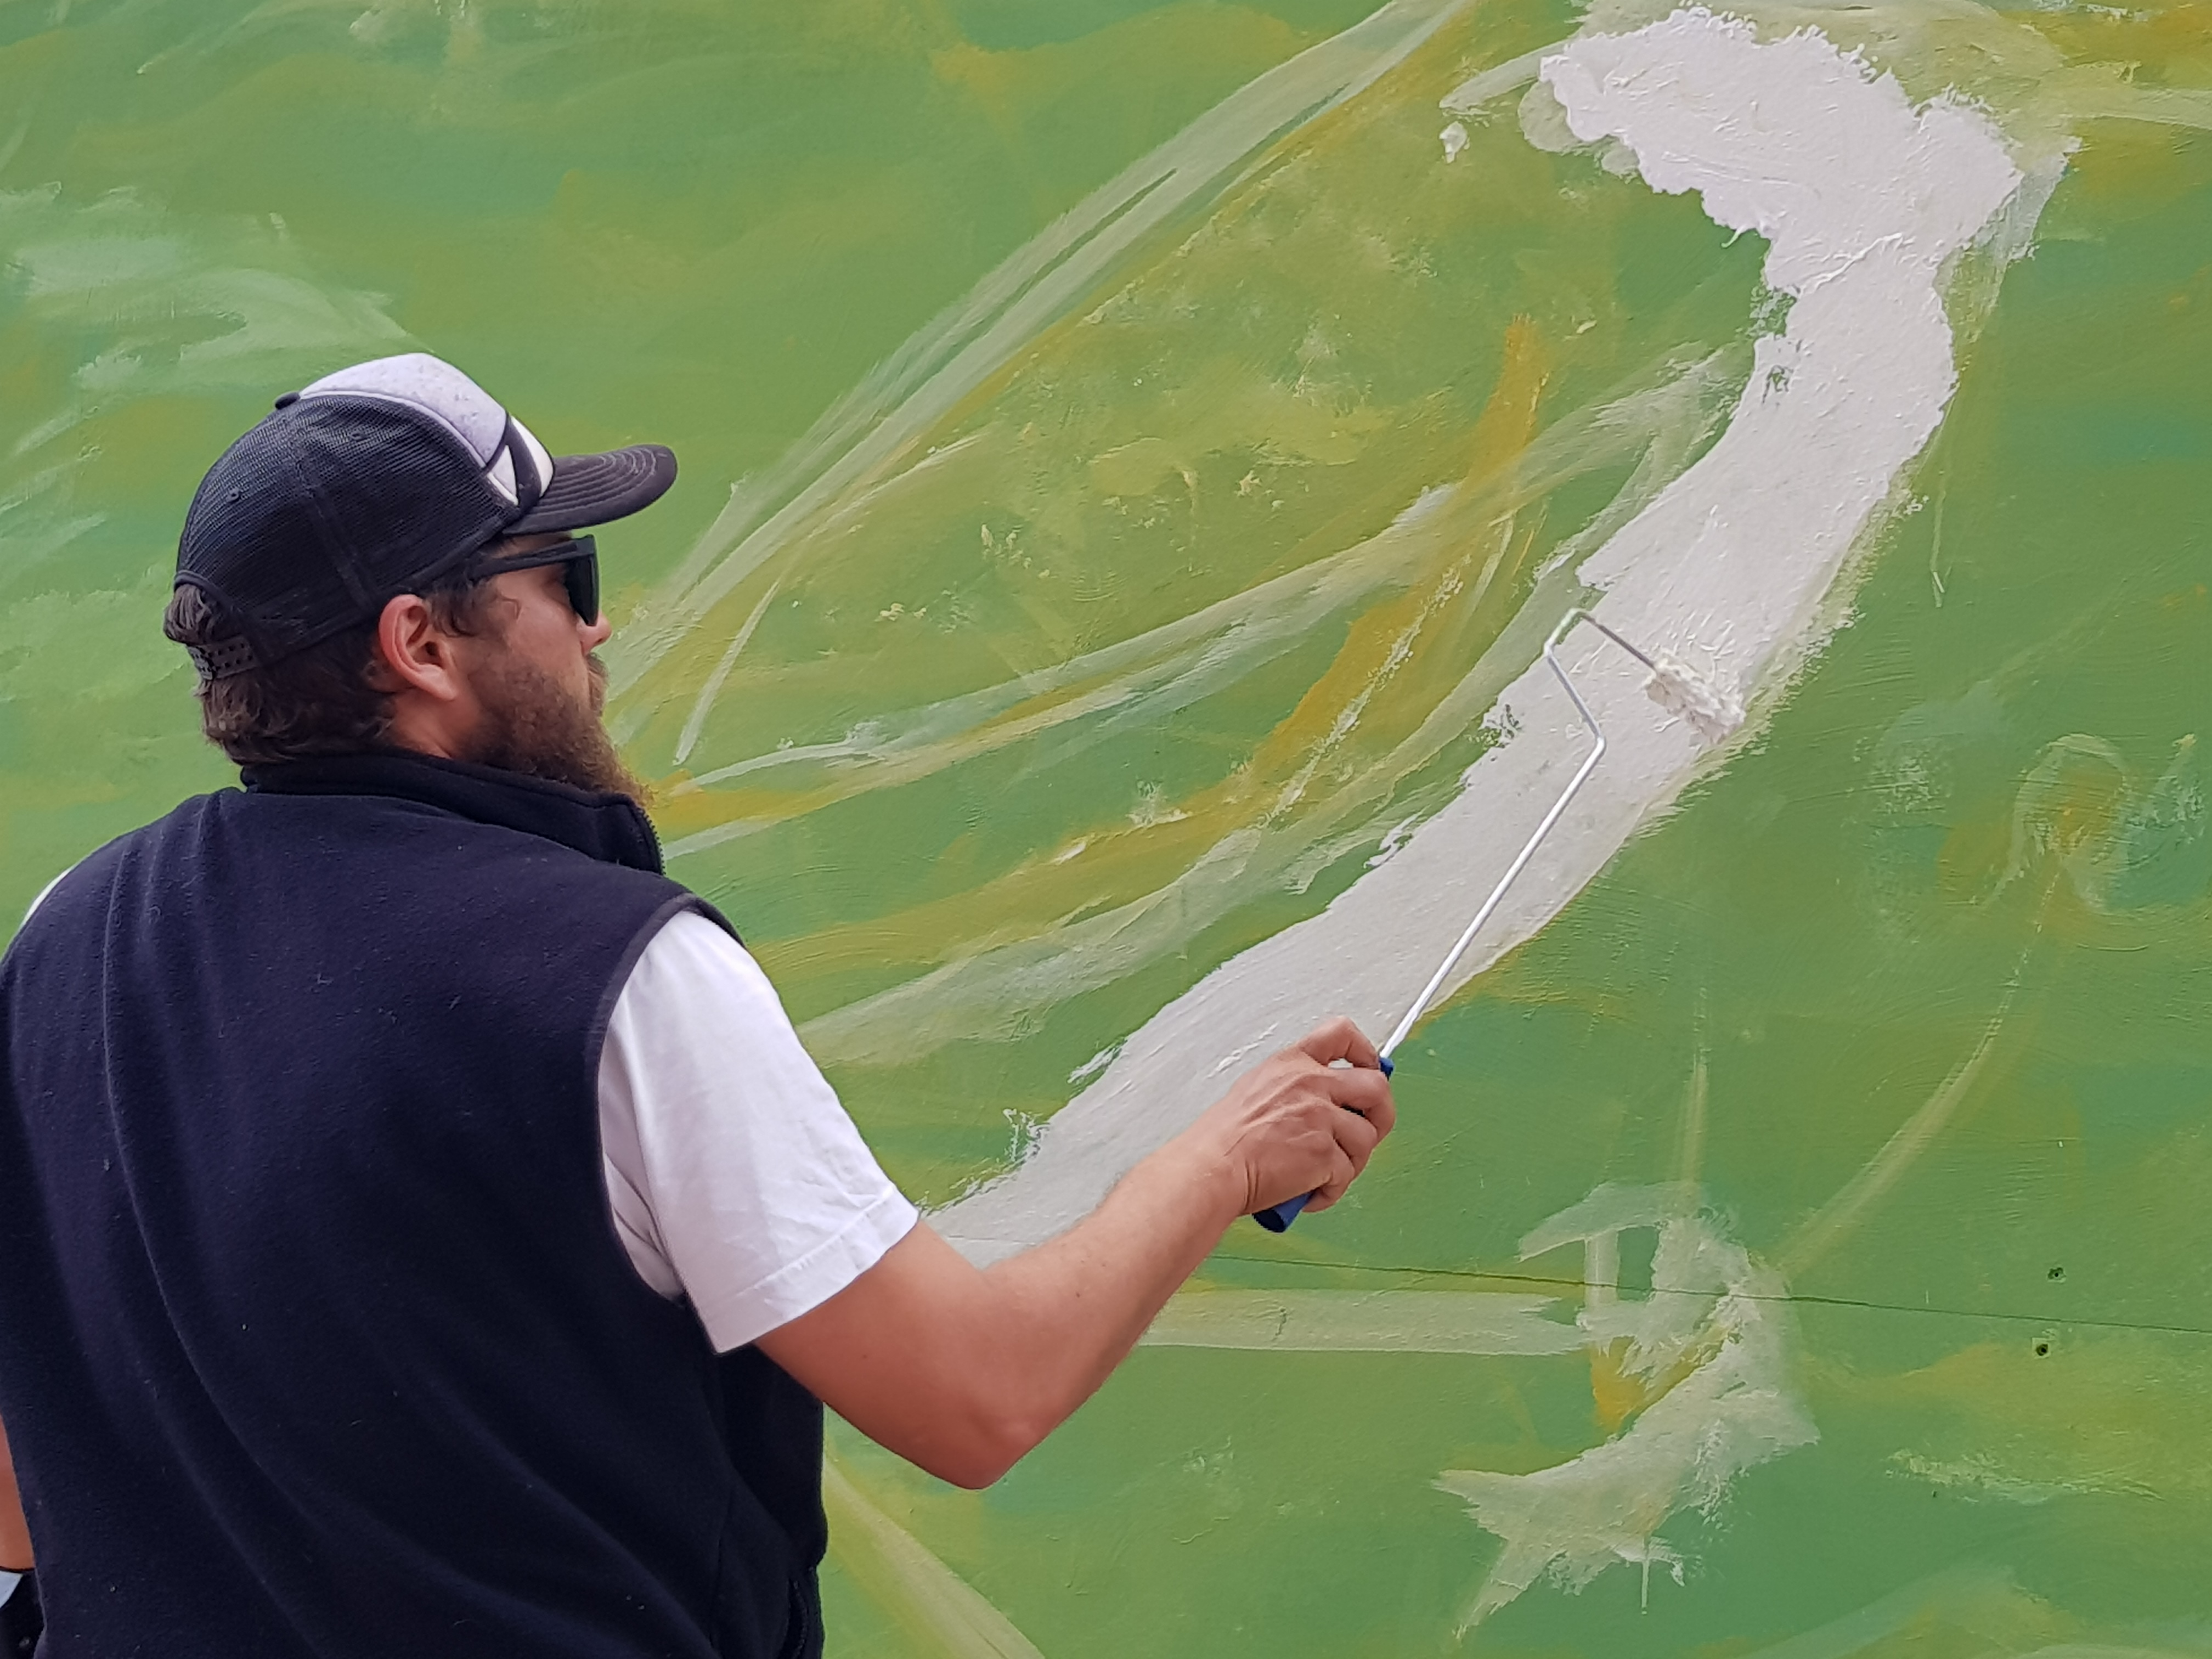 Dorable Arte De Uñas Llamas Motivo - Ideas Para Pintar Uñas - knxc.info